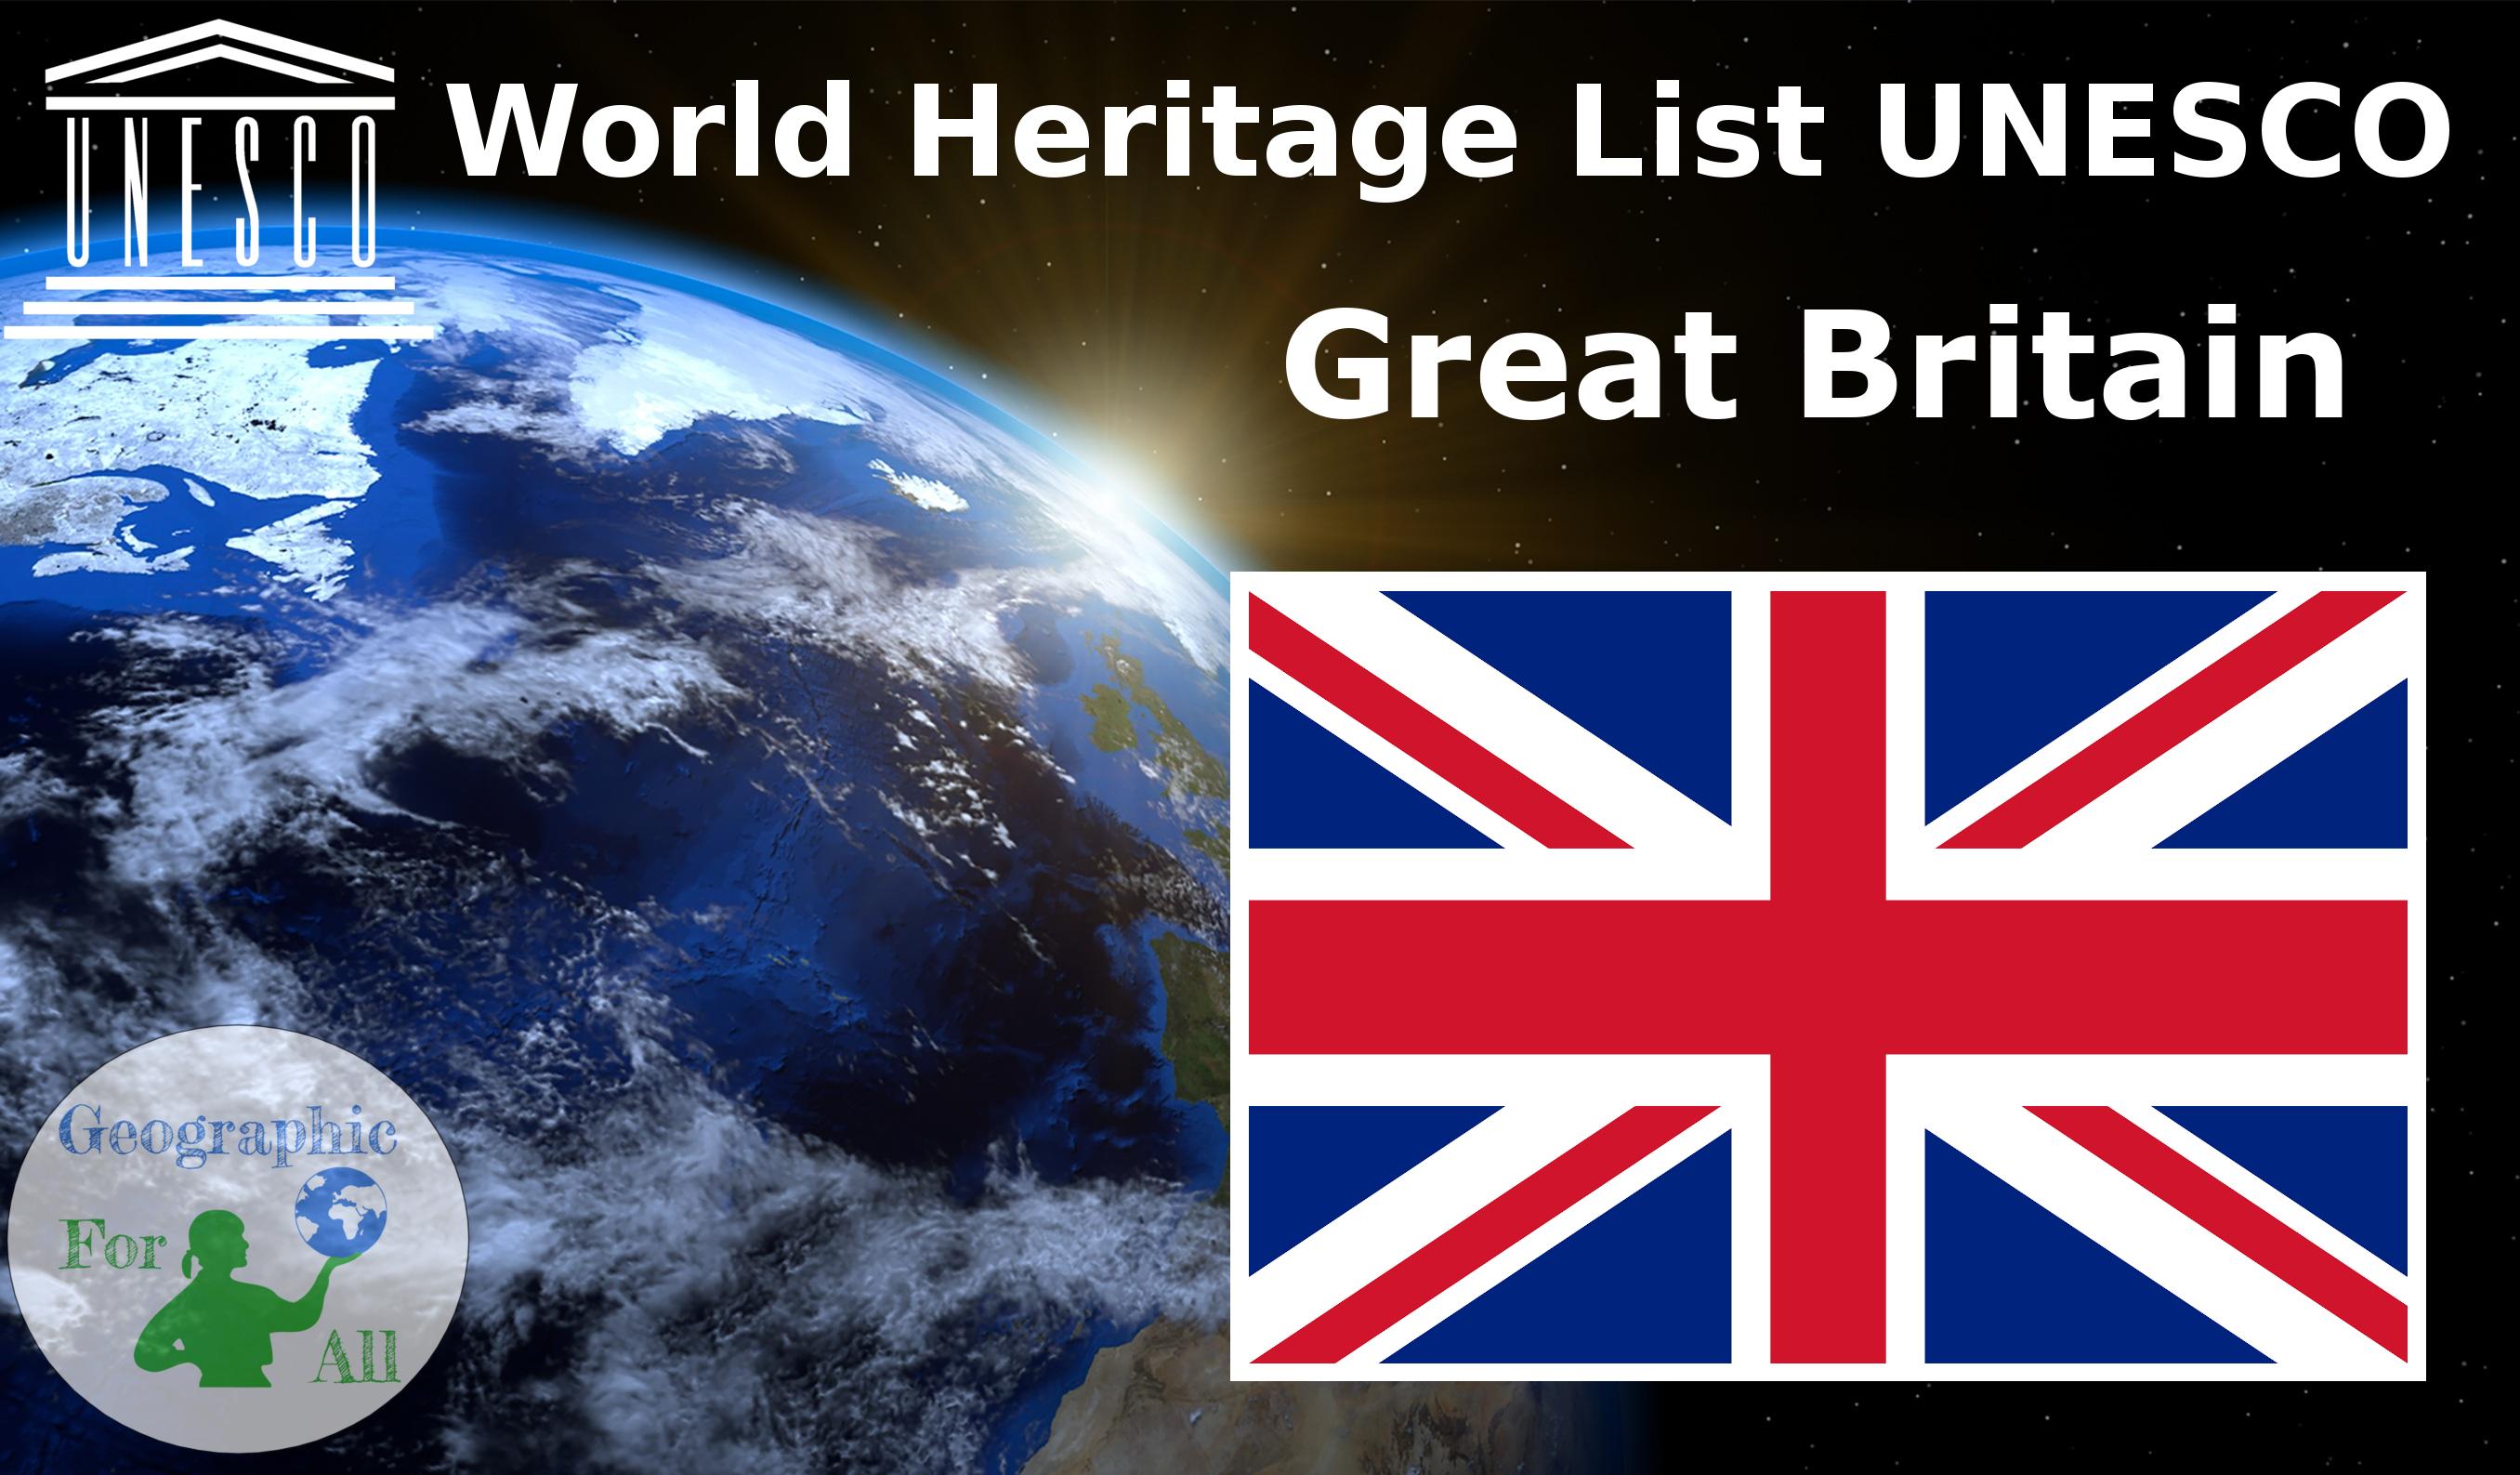 World Heritage List UNESCO - Great Britain